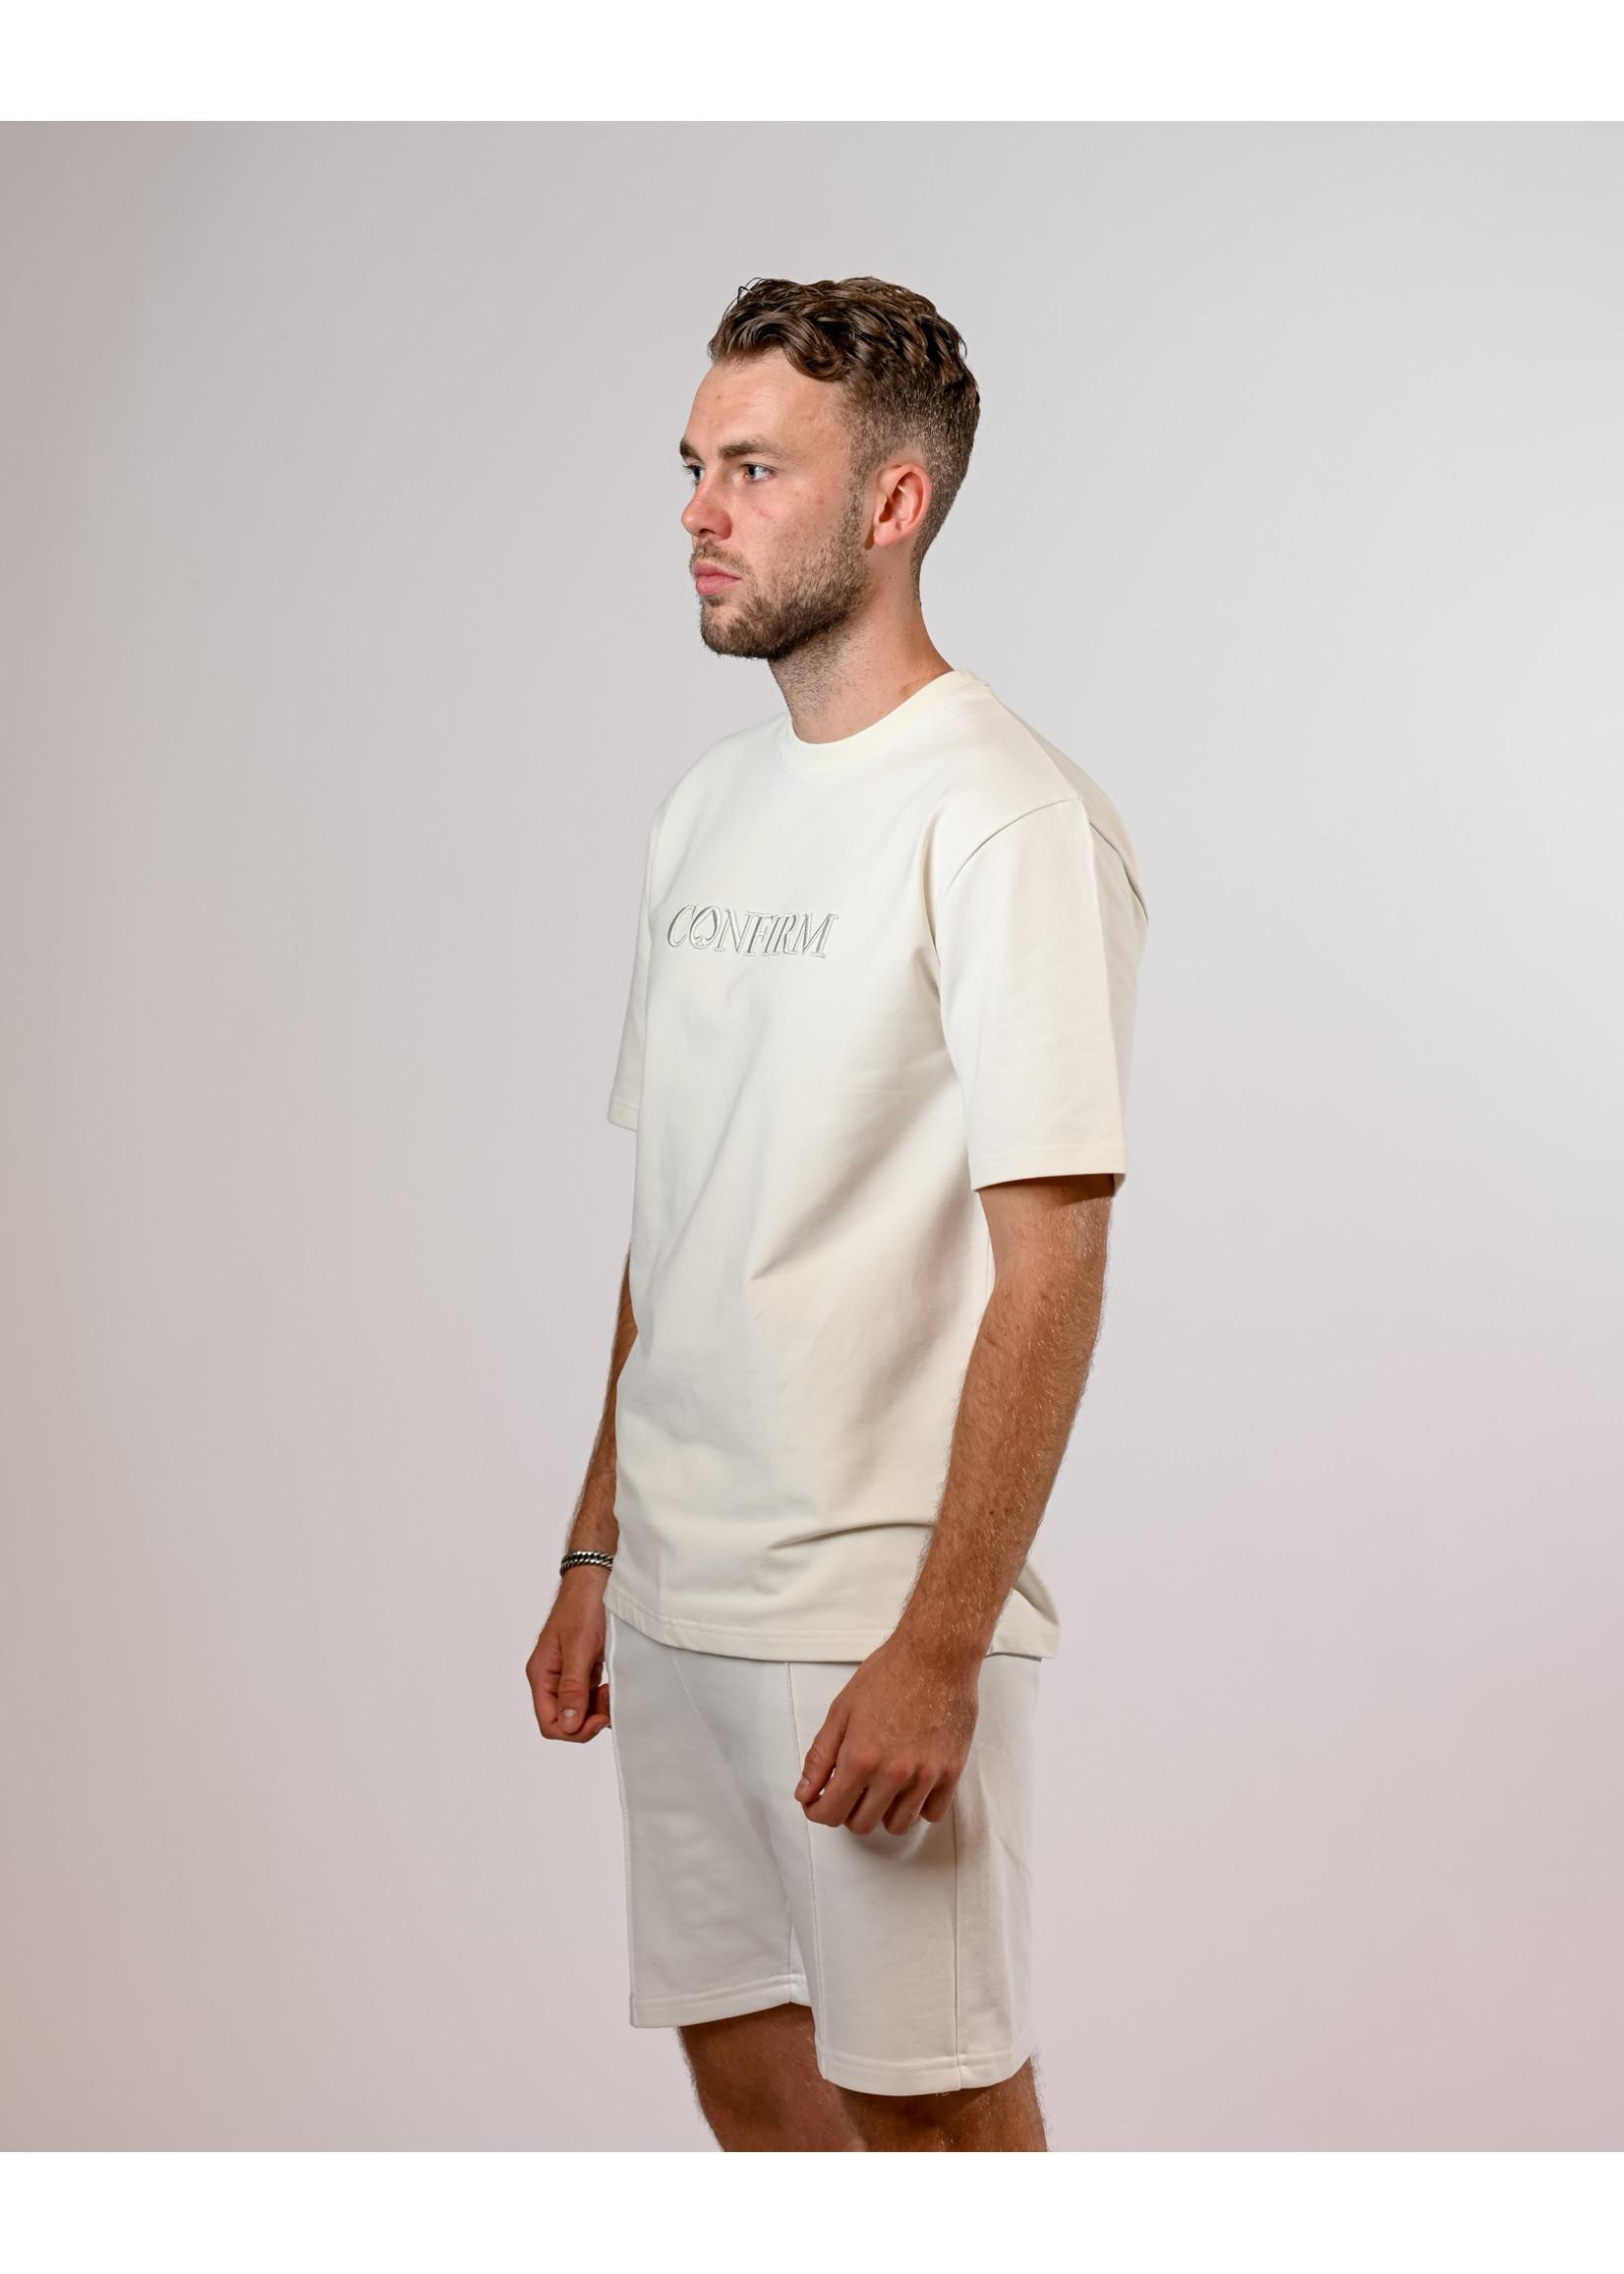 Confirm classic T-shirt TST - Off white